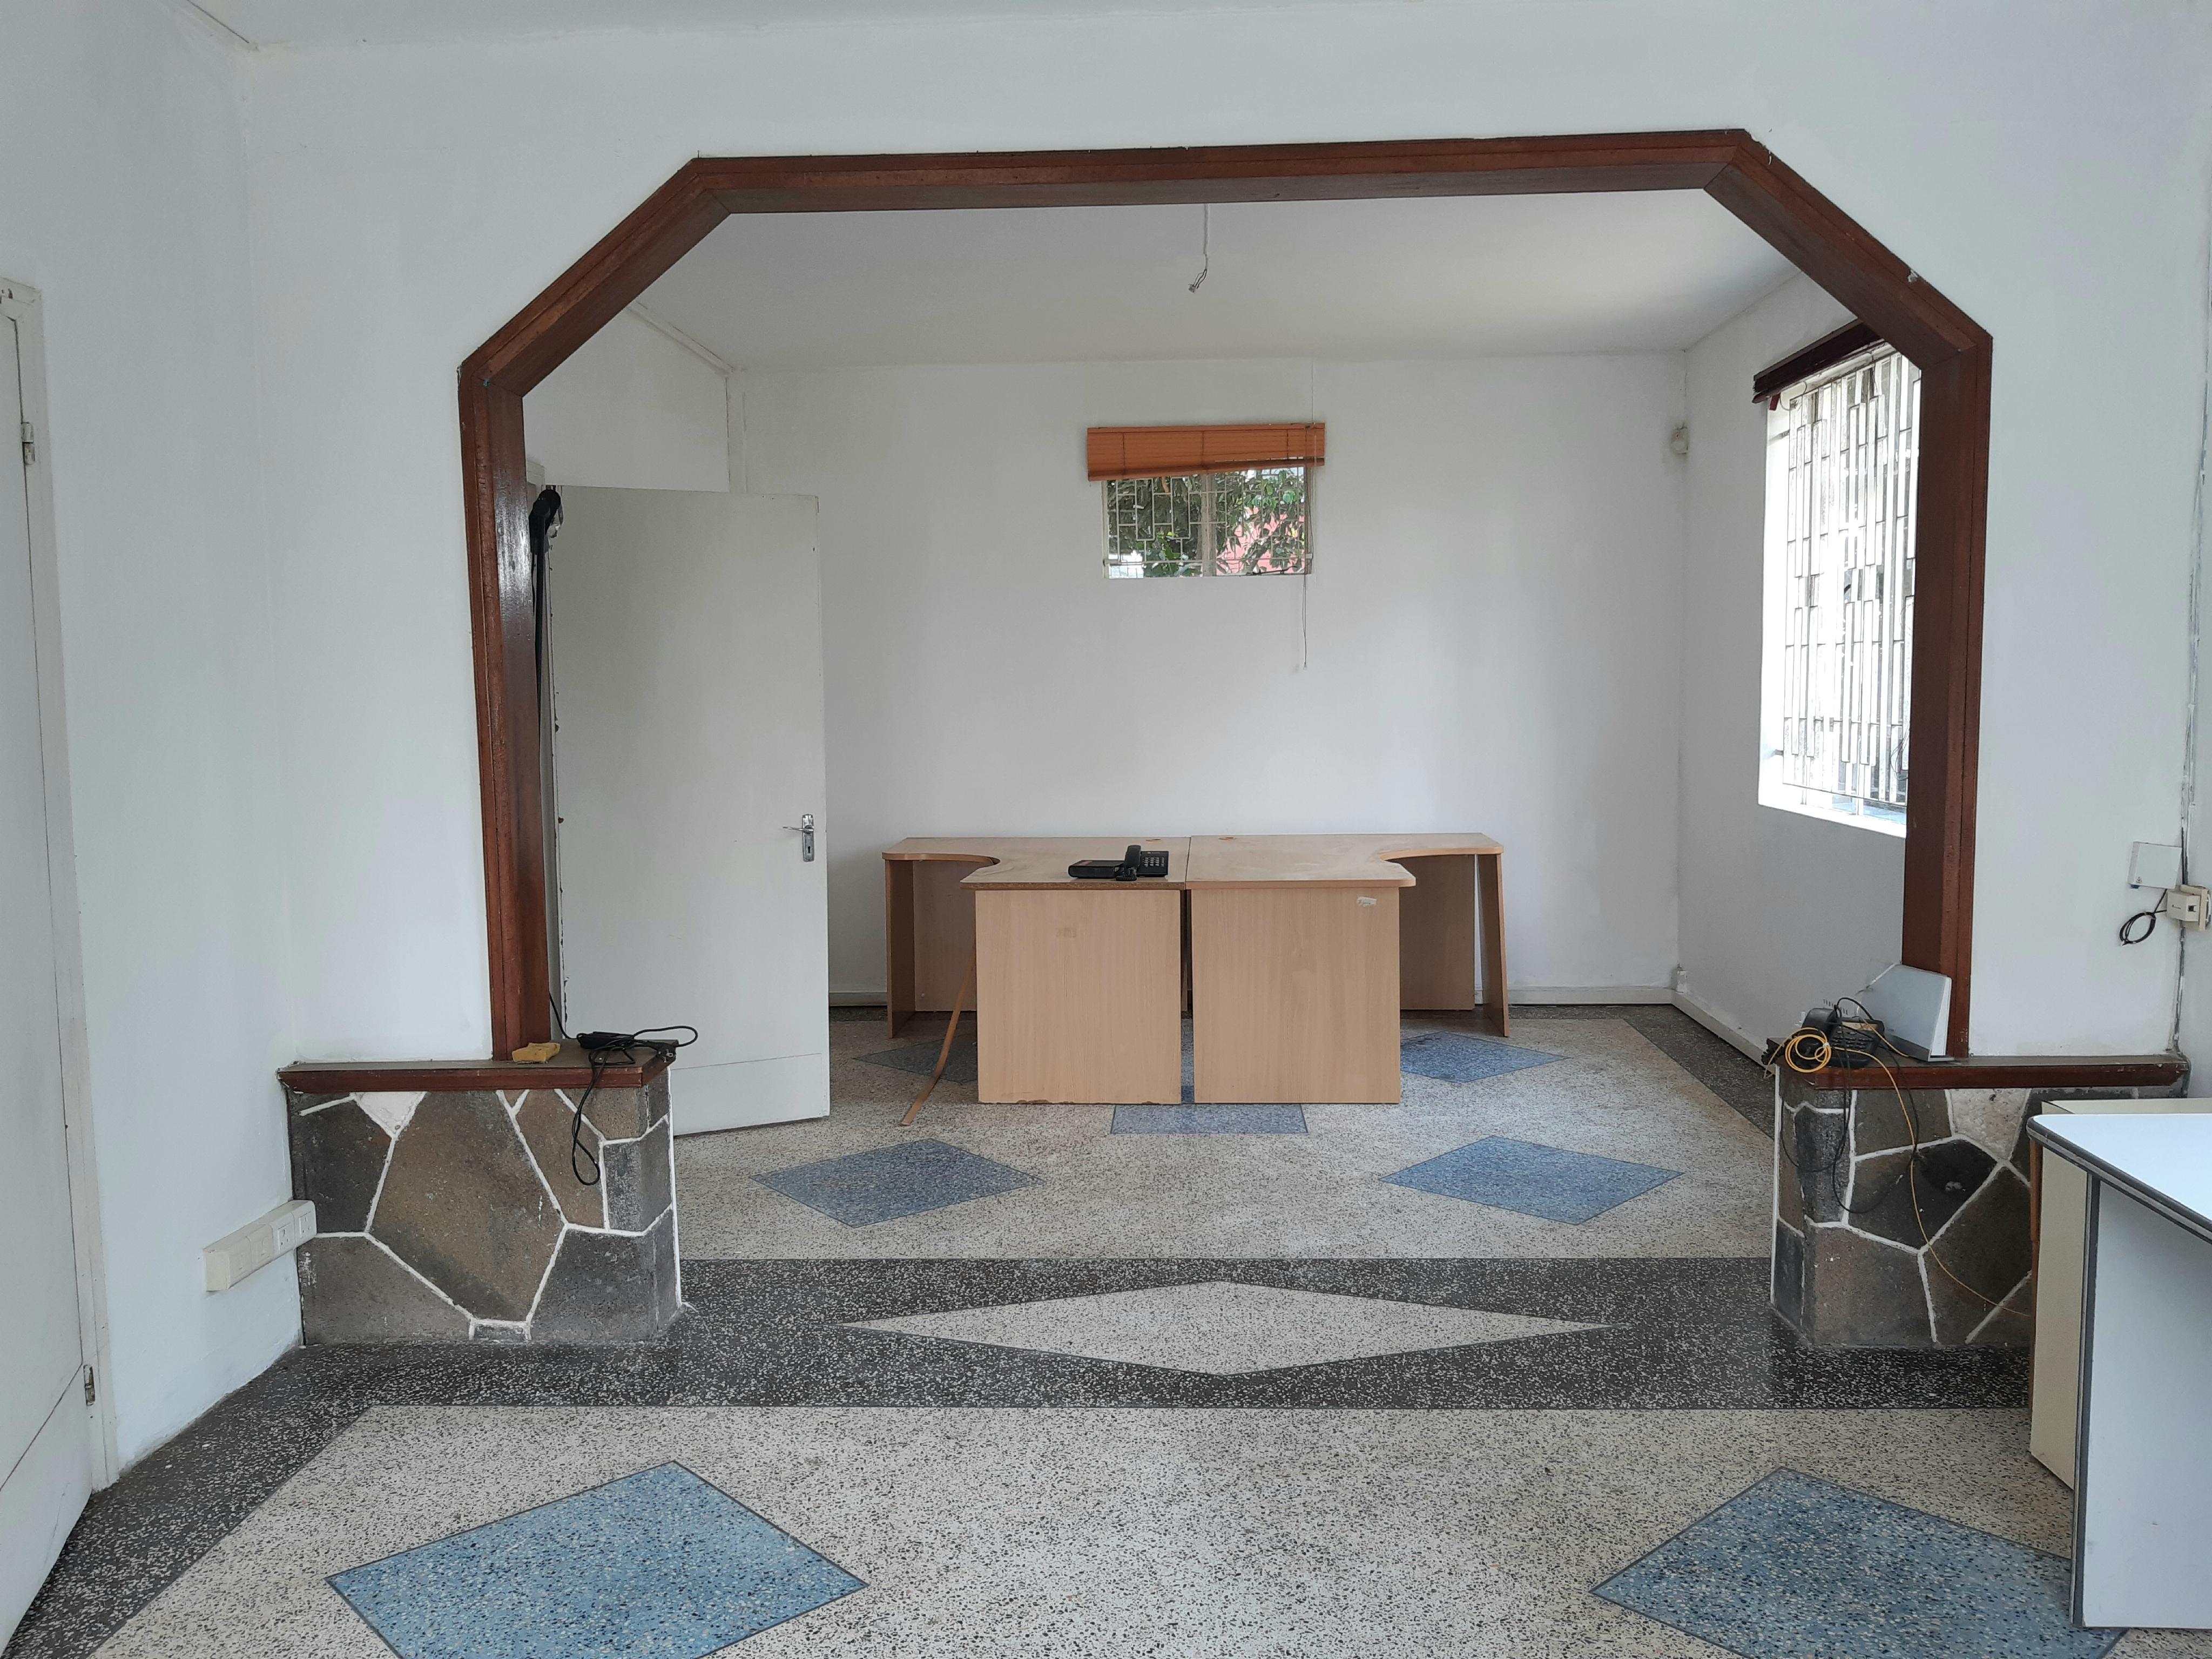 Maison à Usage Bureau